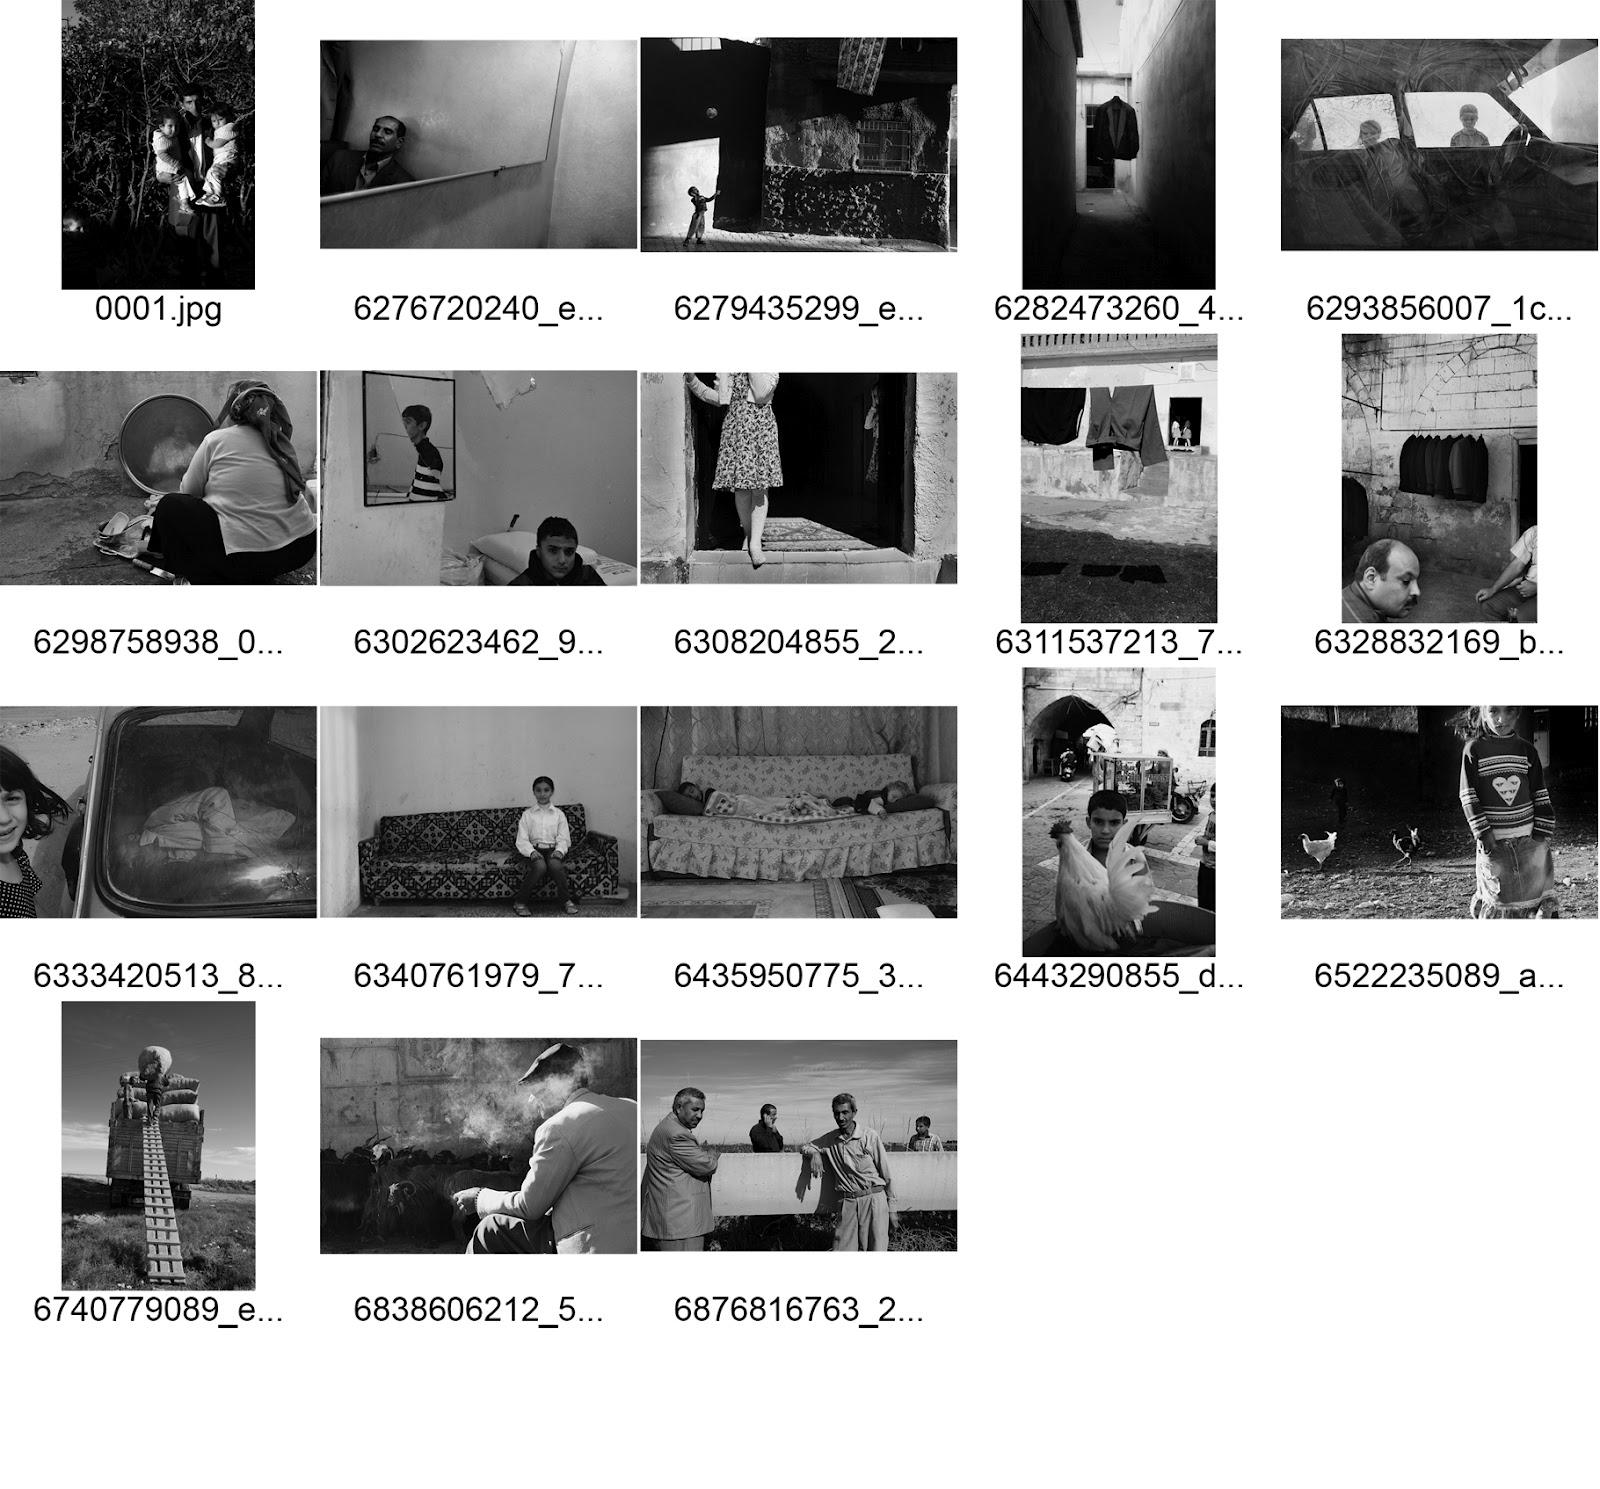 e7d6b191bbf ... τμήμα της φωτογραφίας και έχω παρακολουθήσει σεμινάρια του Πλάτωνα  Ριβέλλη στον φωτογραφικό Κύκλο. Έχω υπάρξει για πολλά χρόνια μέλος της  φωτογραφικής ...